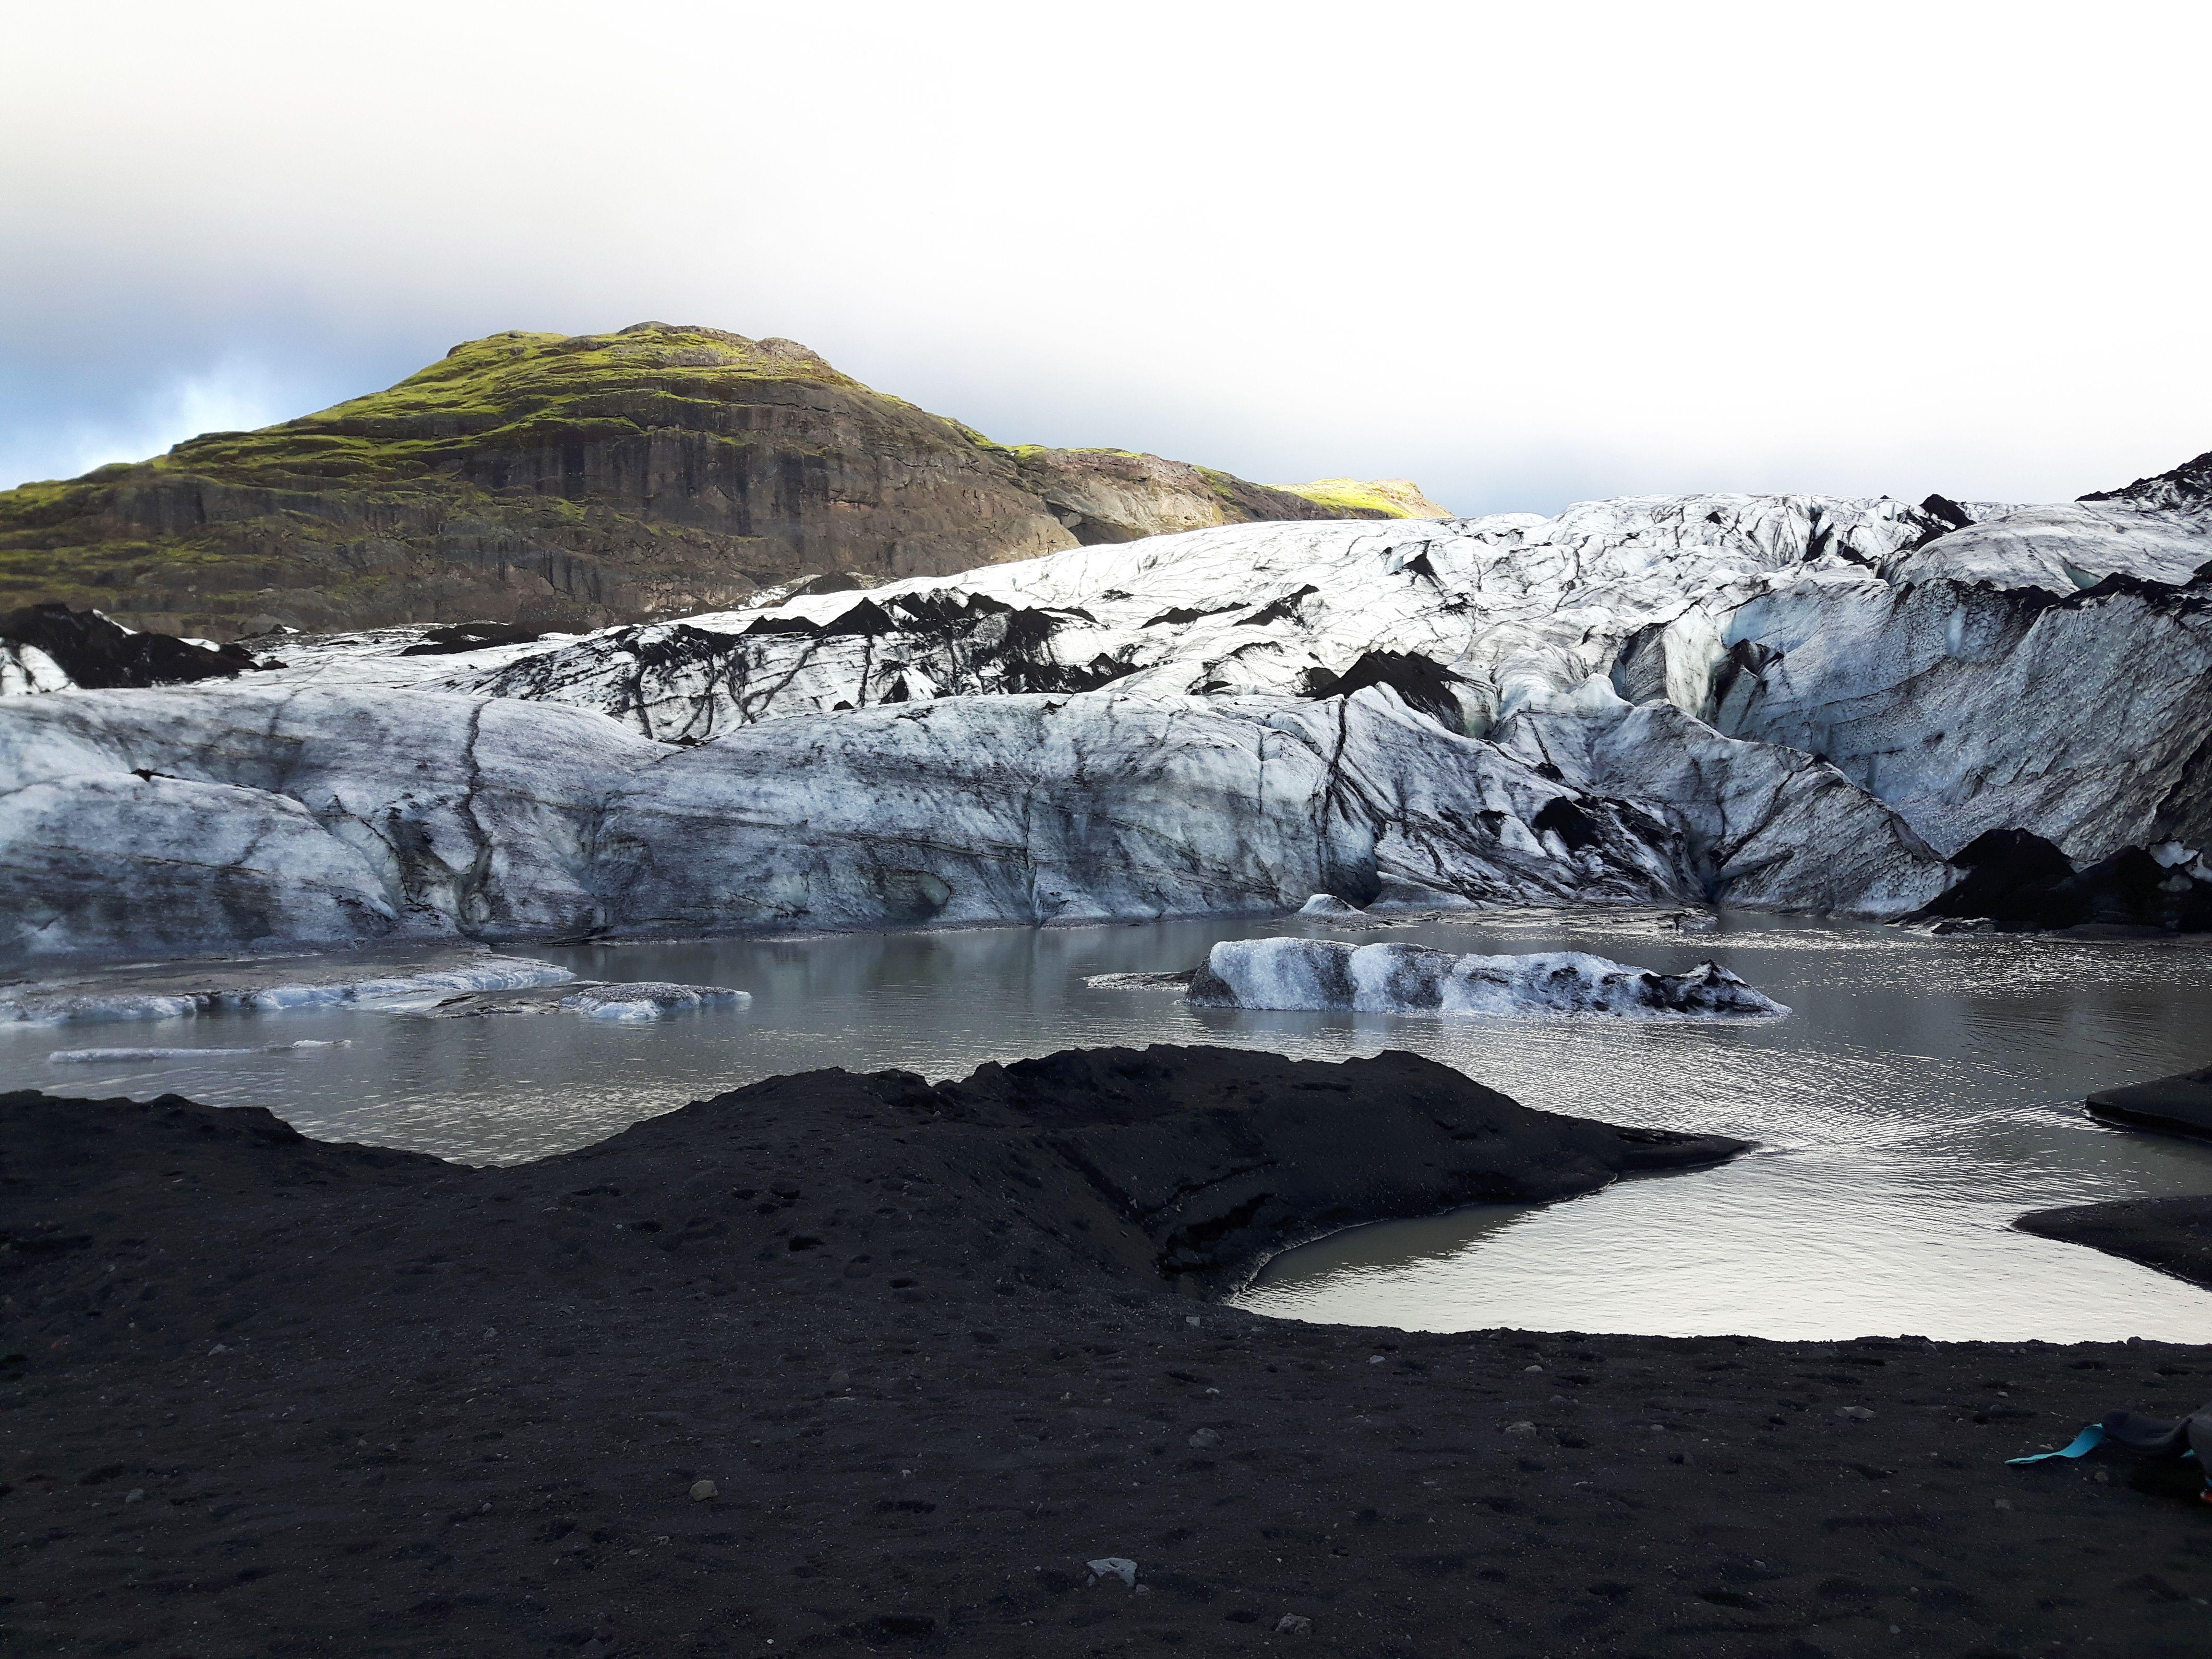 Hiking And Ice Wall Climbing On Solheimajokull Glacier